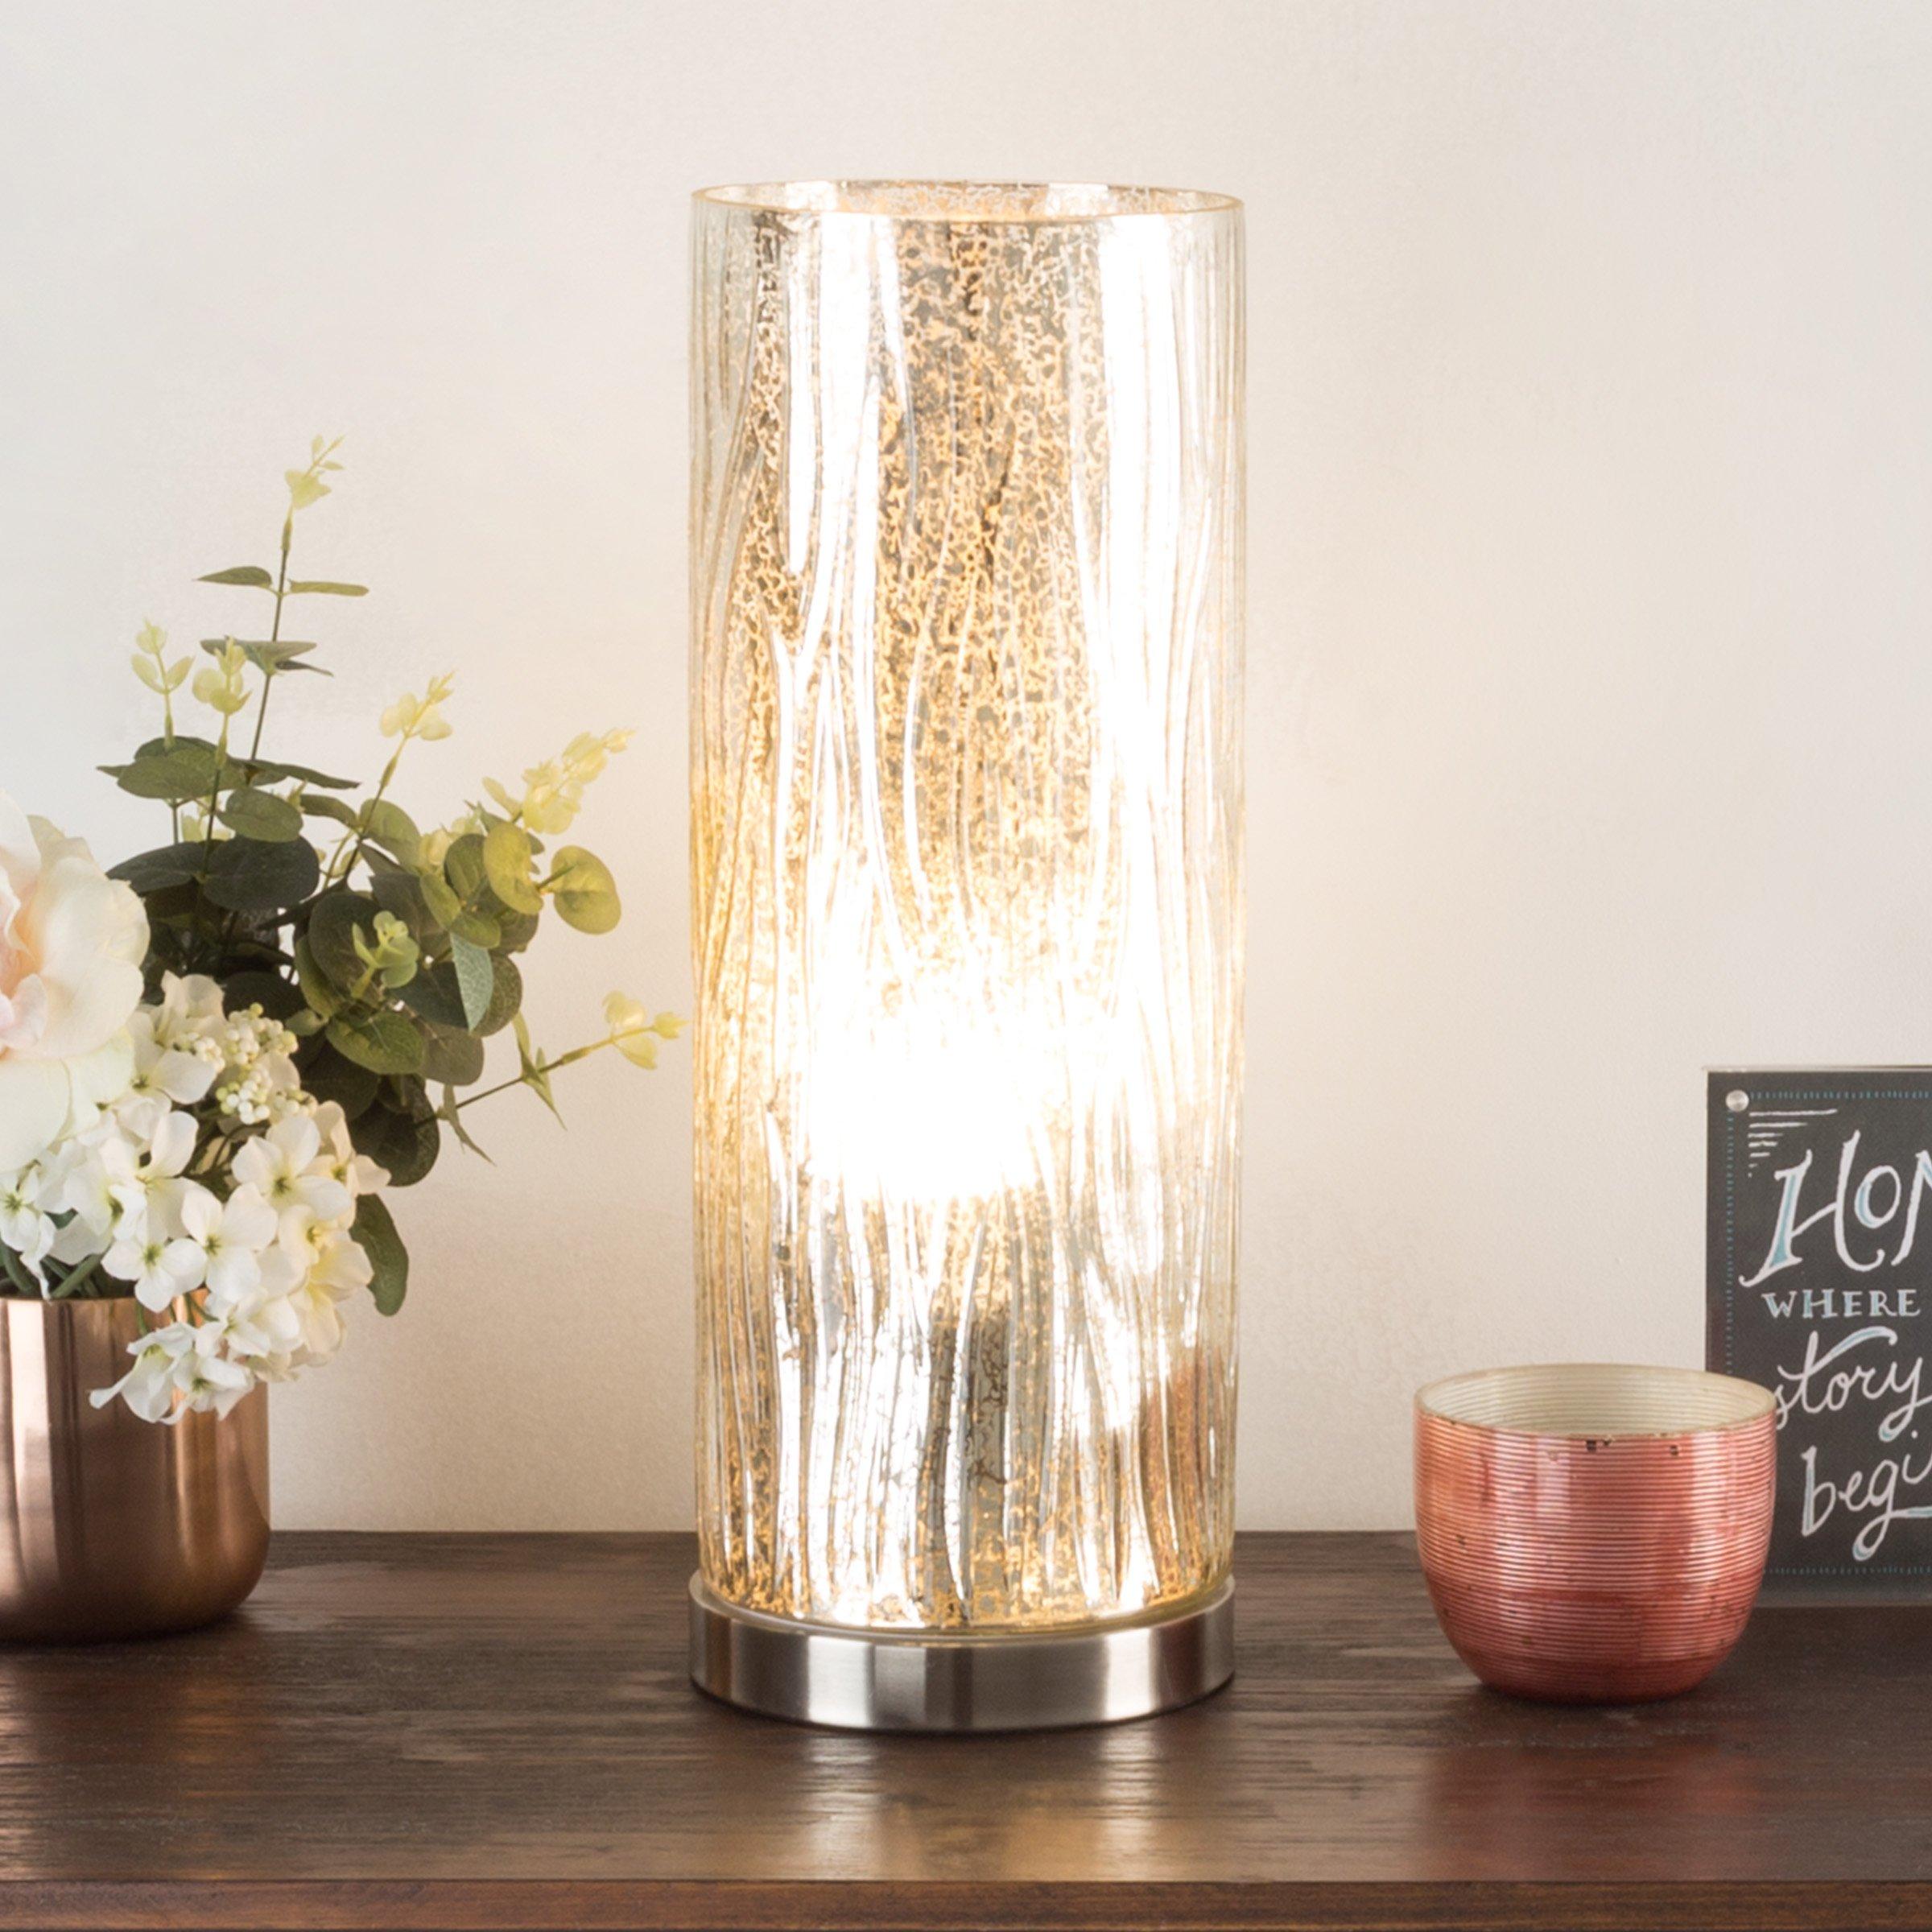 Lavish Home 72-Uplt-1 Table Lamp with Silver Mercury Finish